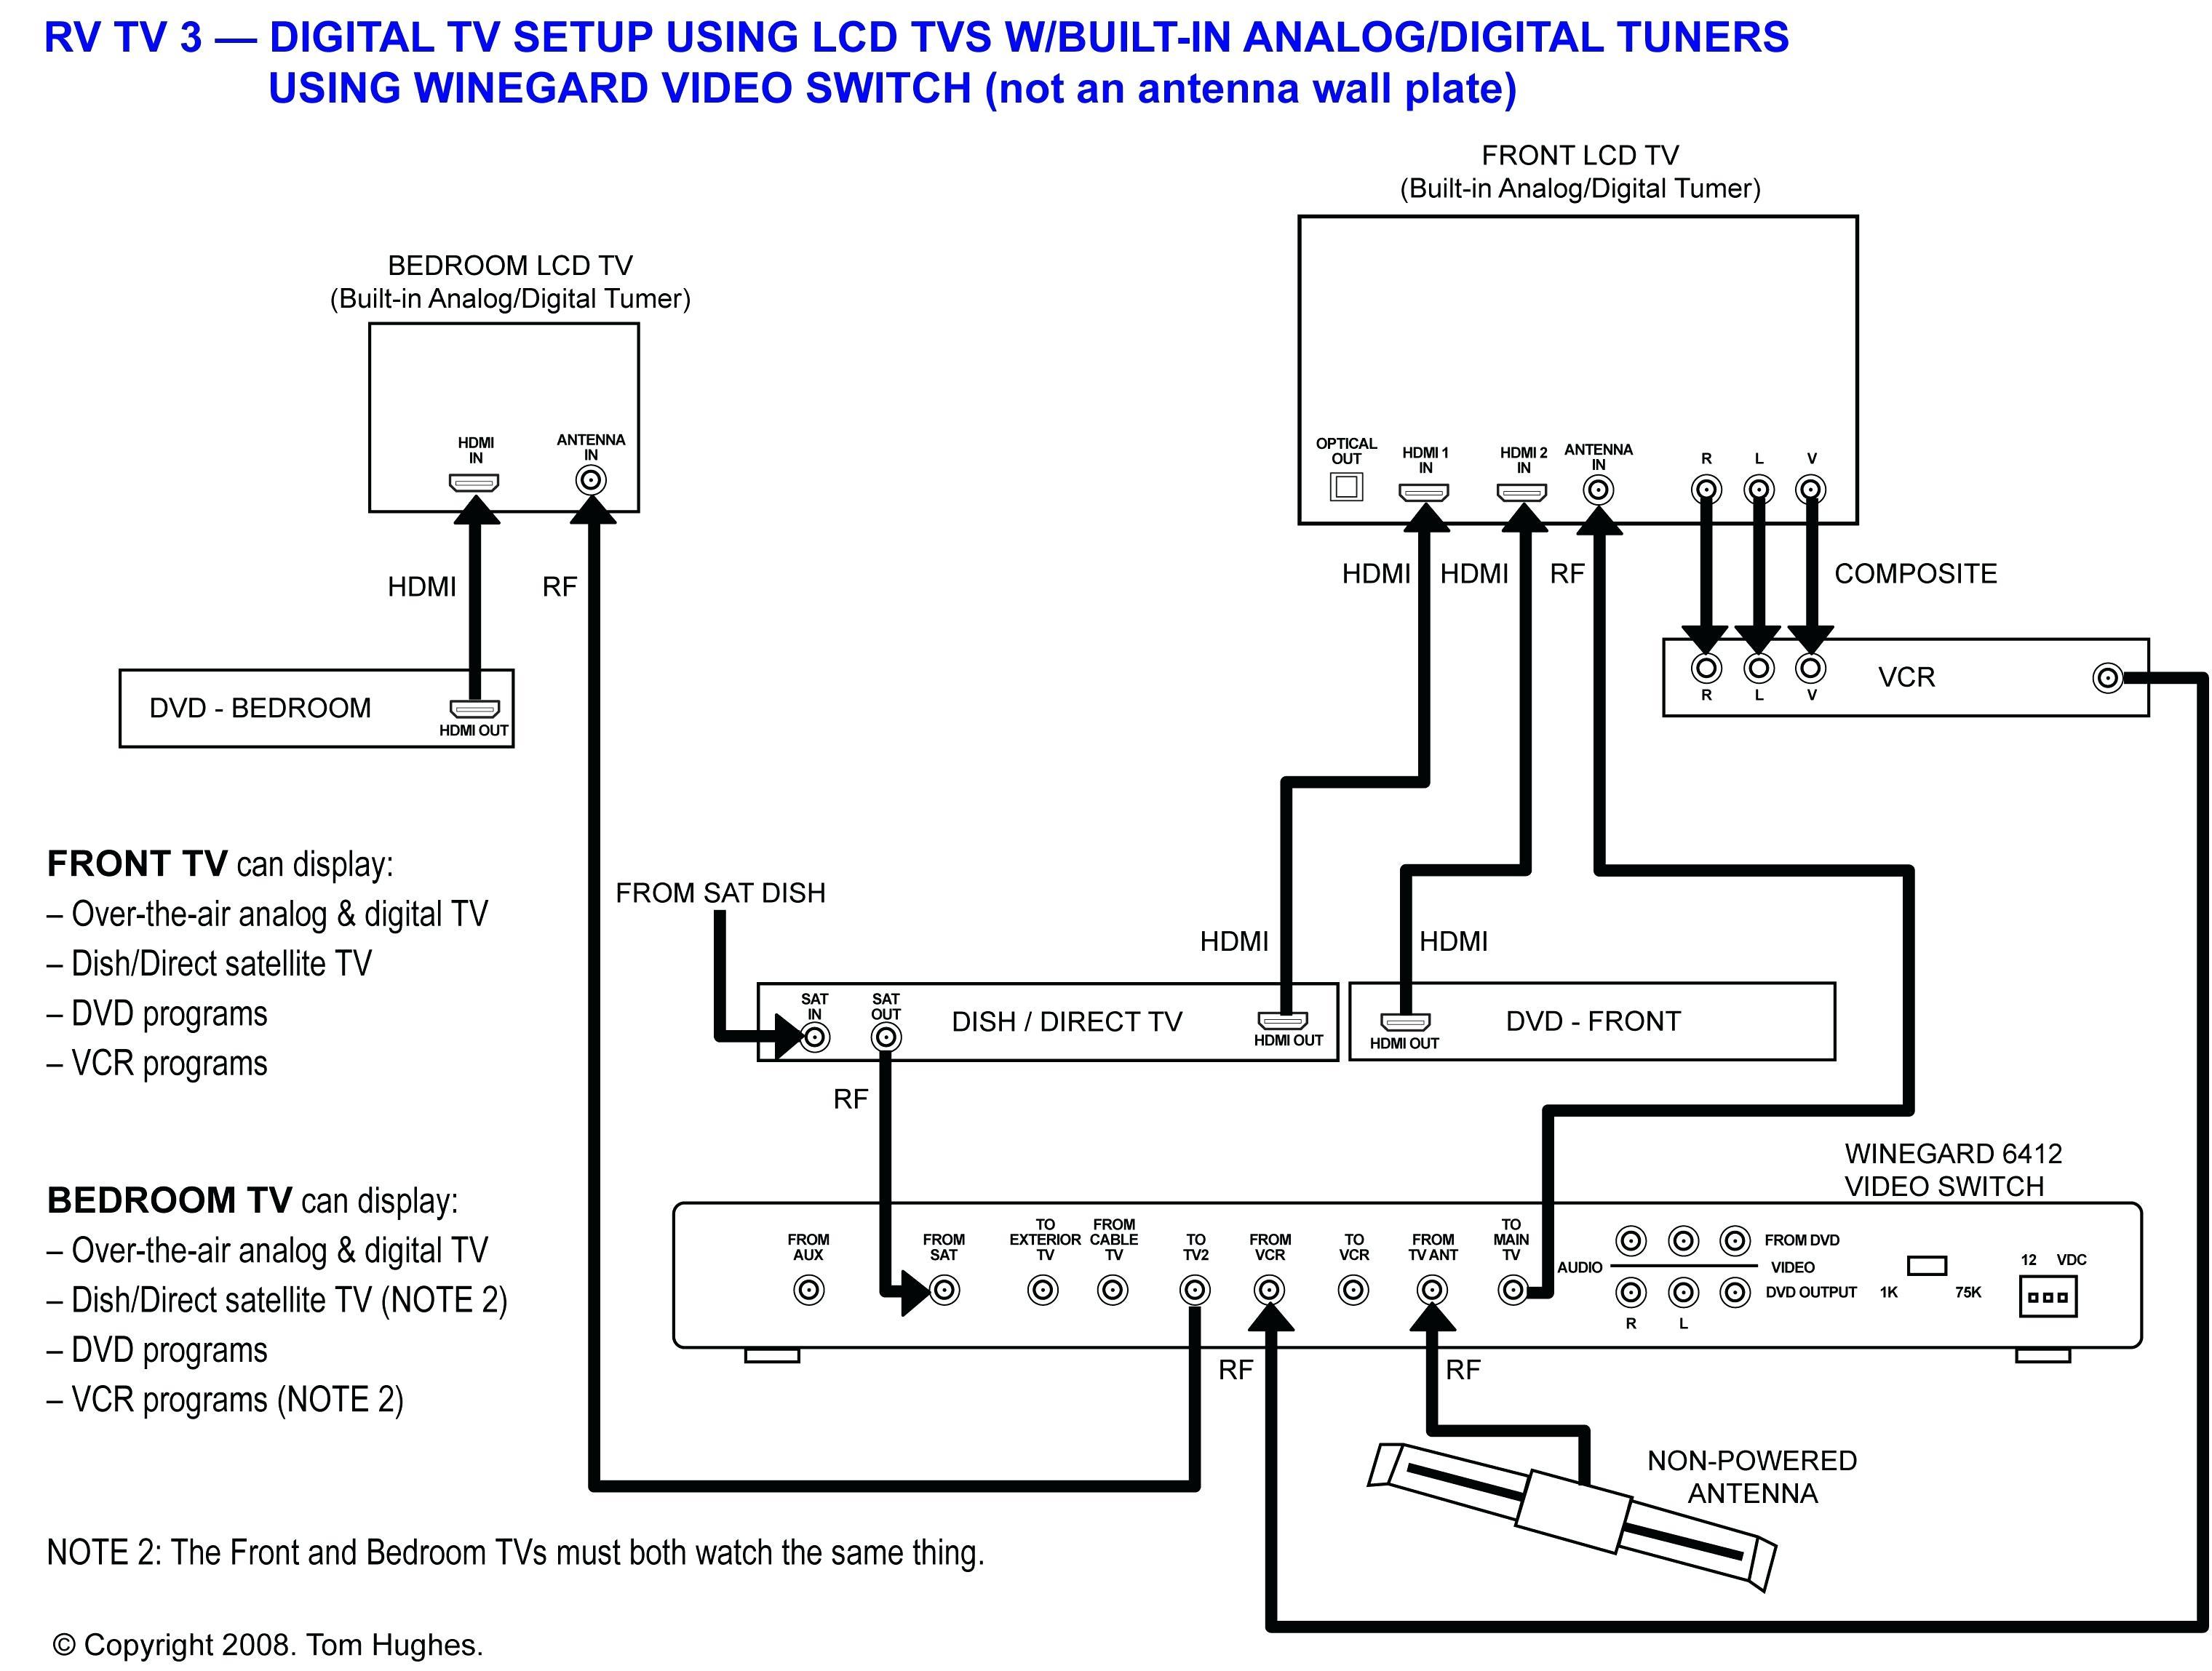 directv swm 32 wiring diagram Collection-Directv Swm 32 Wiring Diagram Direct Satellite Dish For Diagrams 3 Throughout 9-p